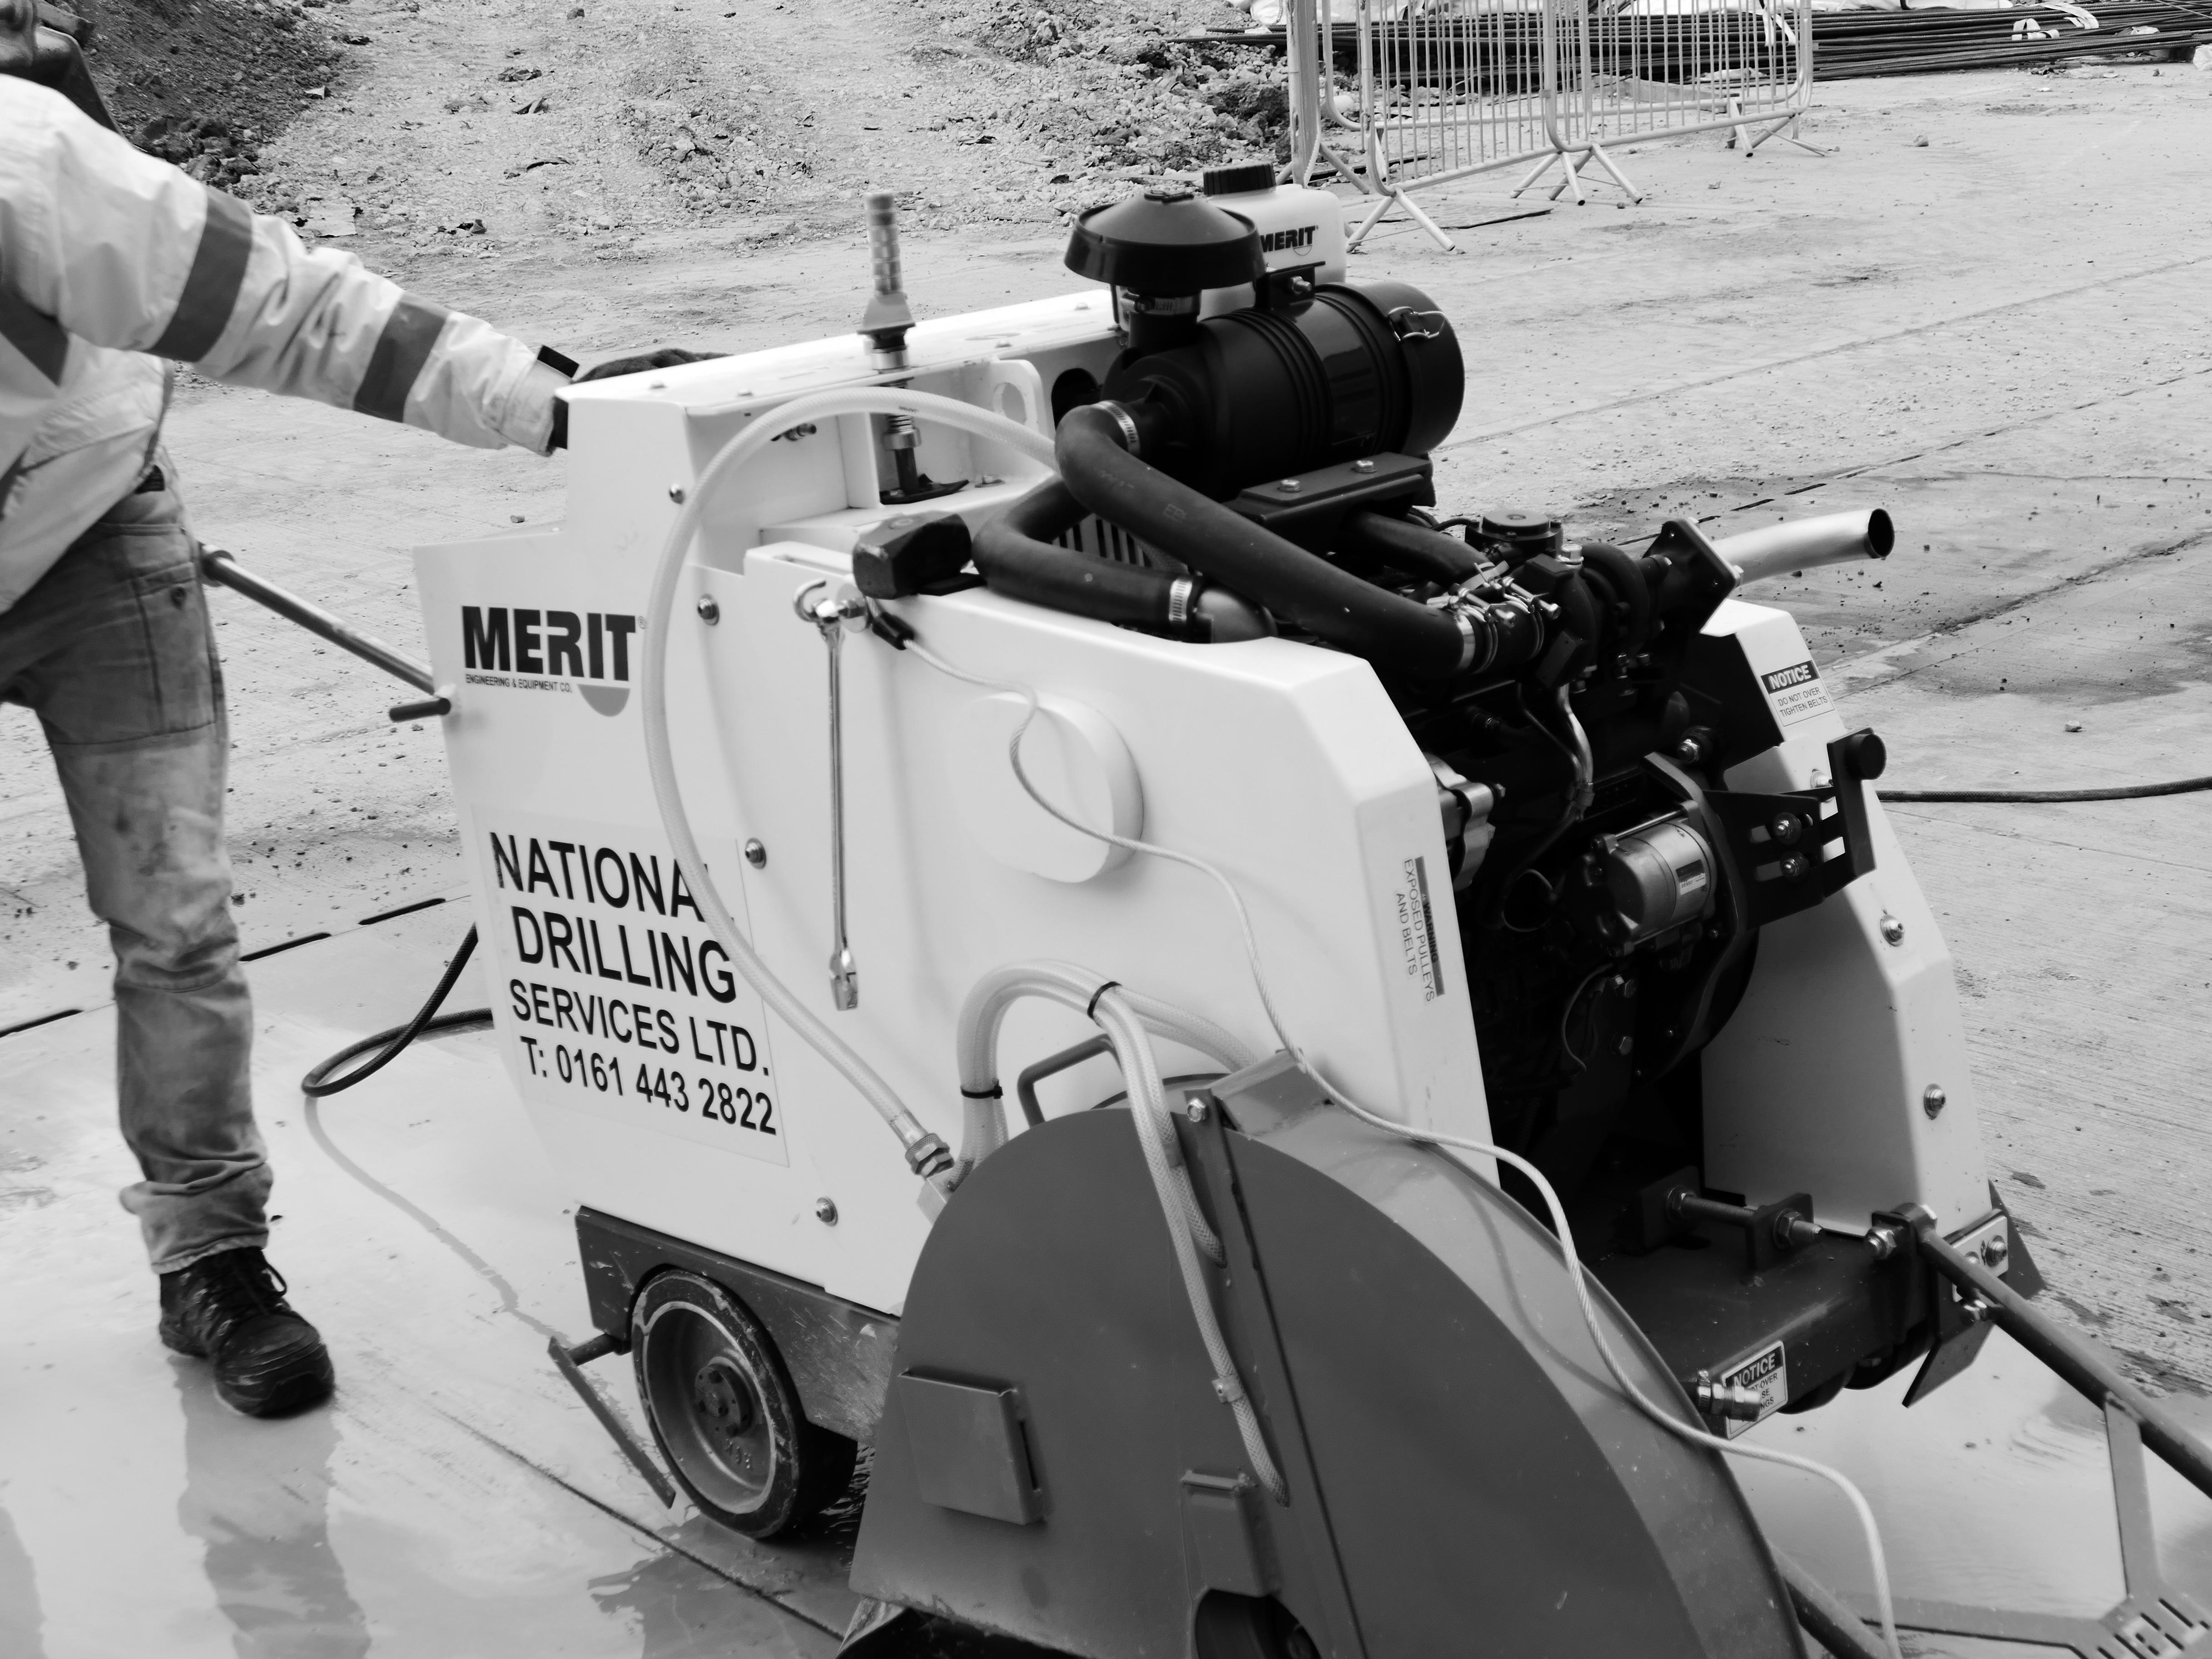 National Drilling Services Leeds Concrete Drilling Services